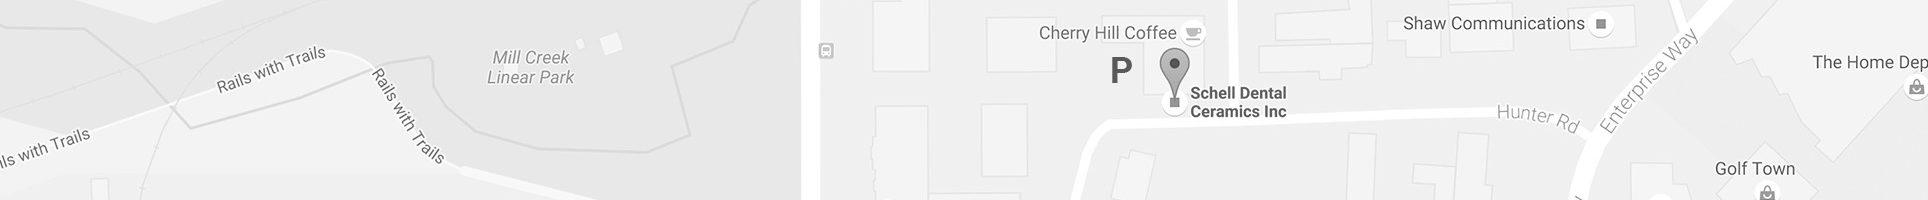 schell-dental-ceramics-inc-map